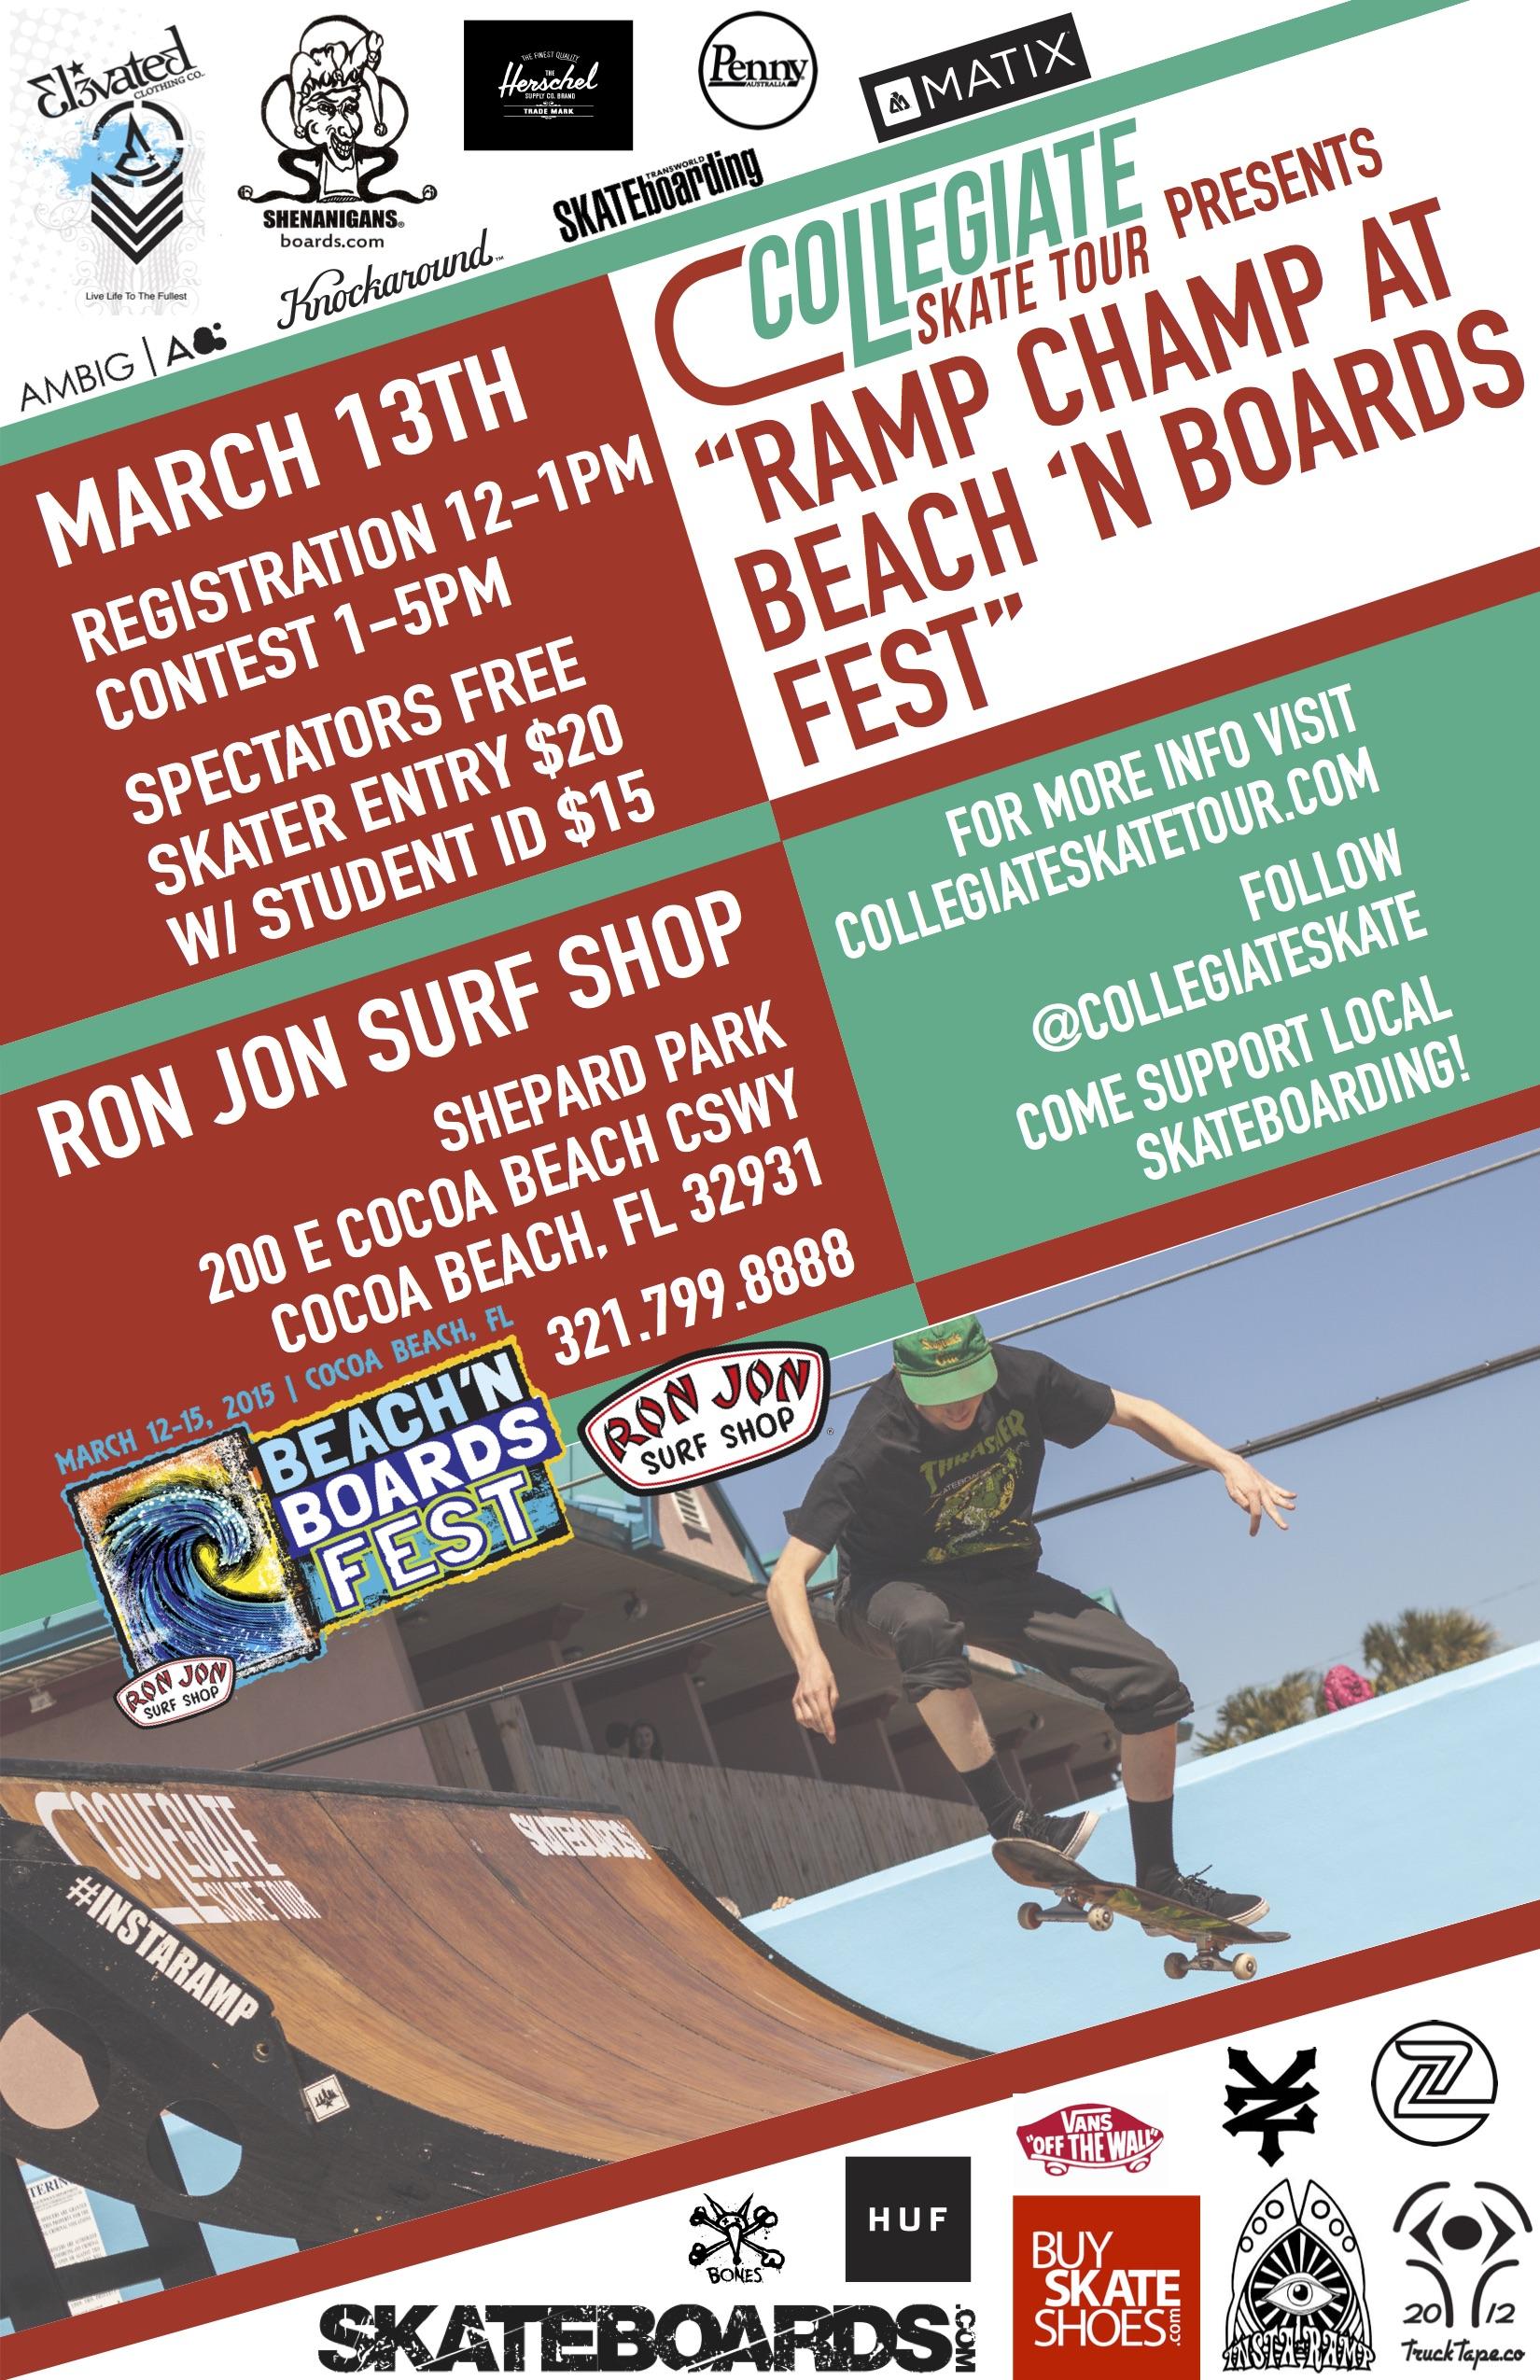 cocoa beach florida collegiate skateboarding tour stop elevated clothing